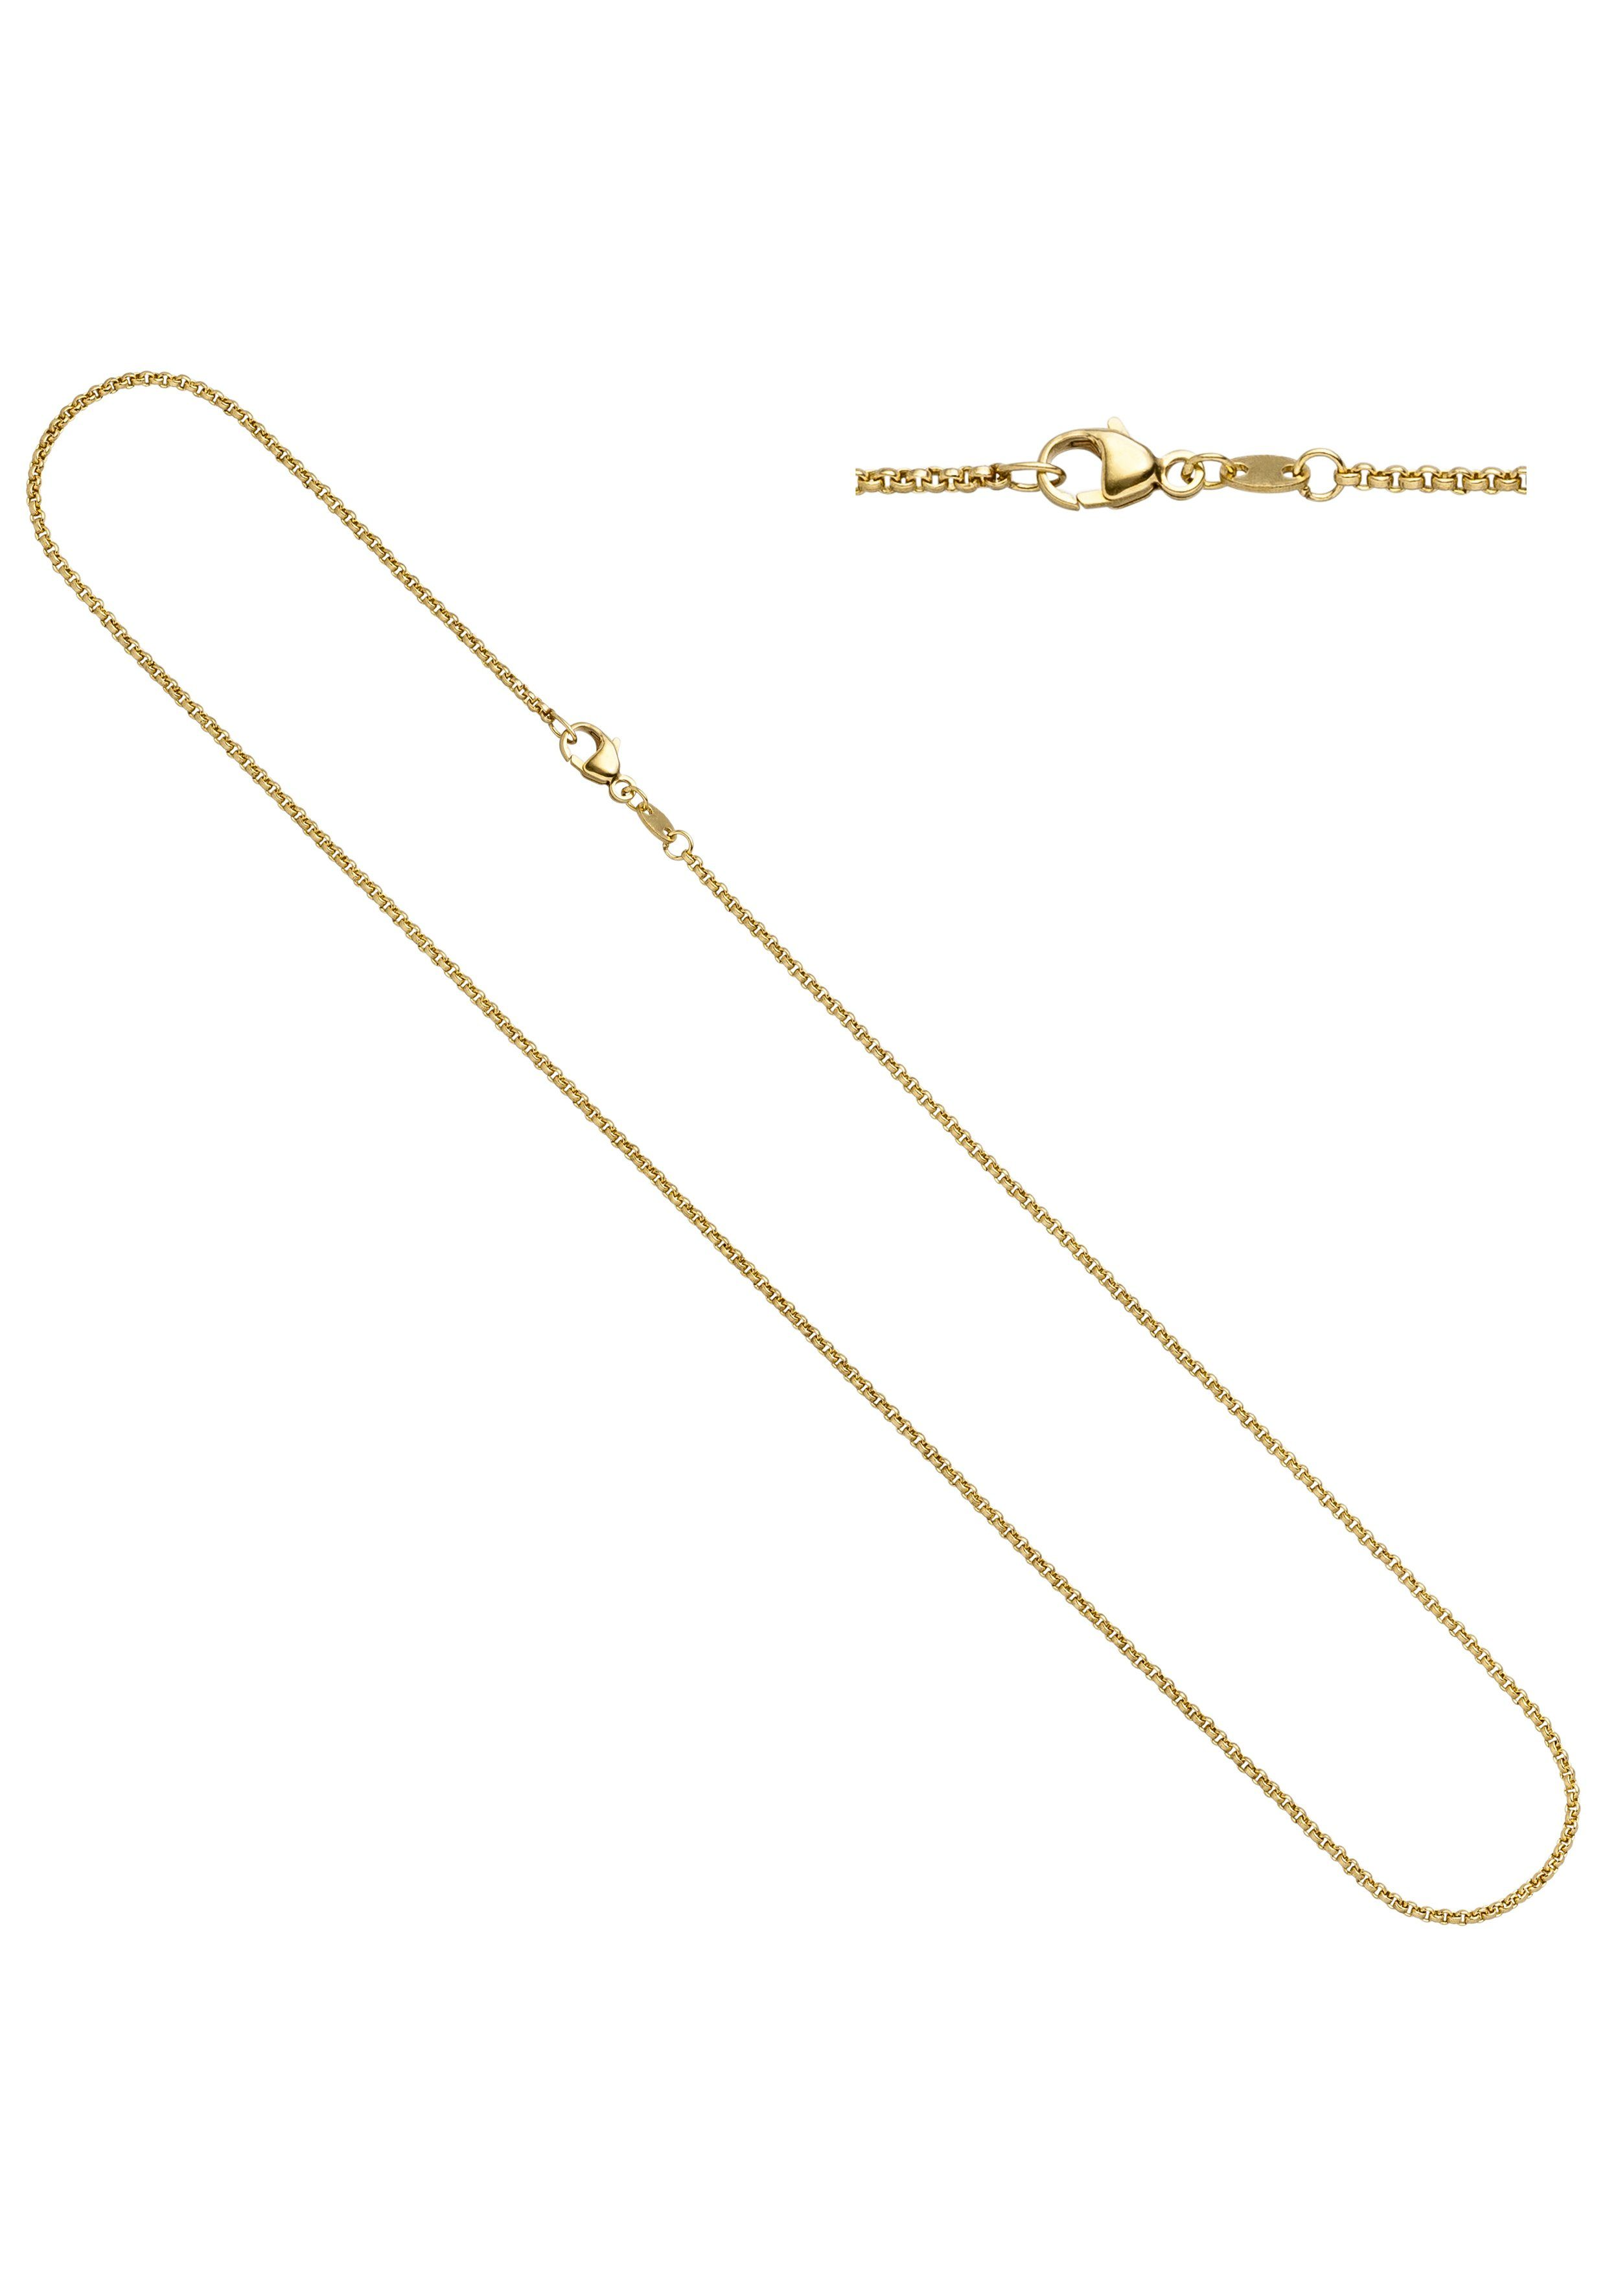 JOBO Goldkette Erbskette 333 Gold 40 cm 1,5 mm